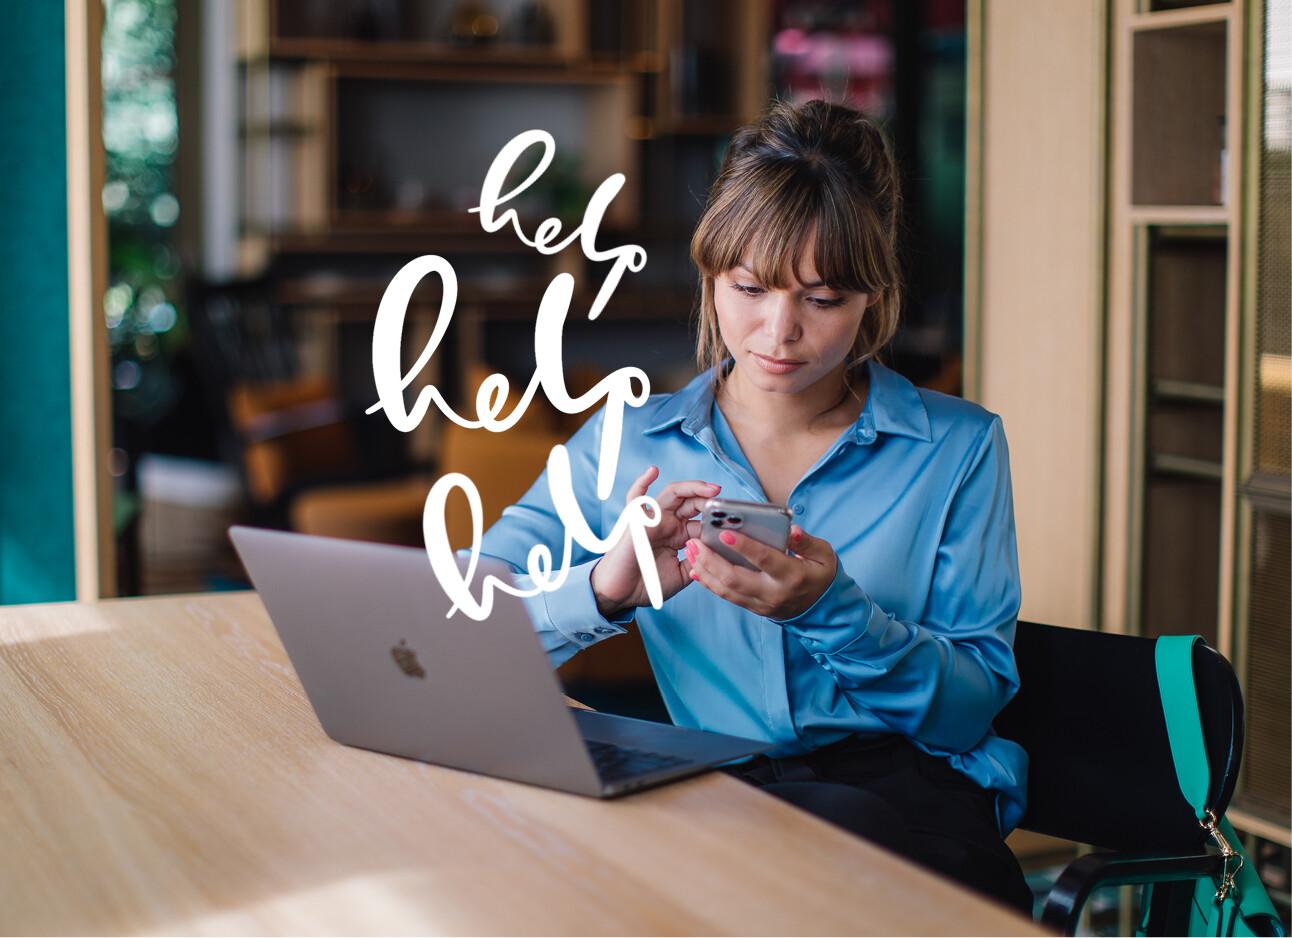 kiki achter computer en laptop